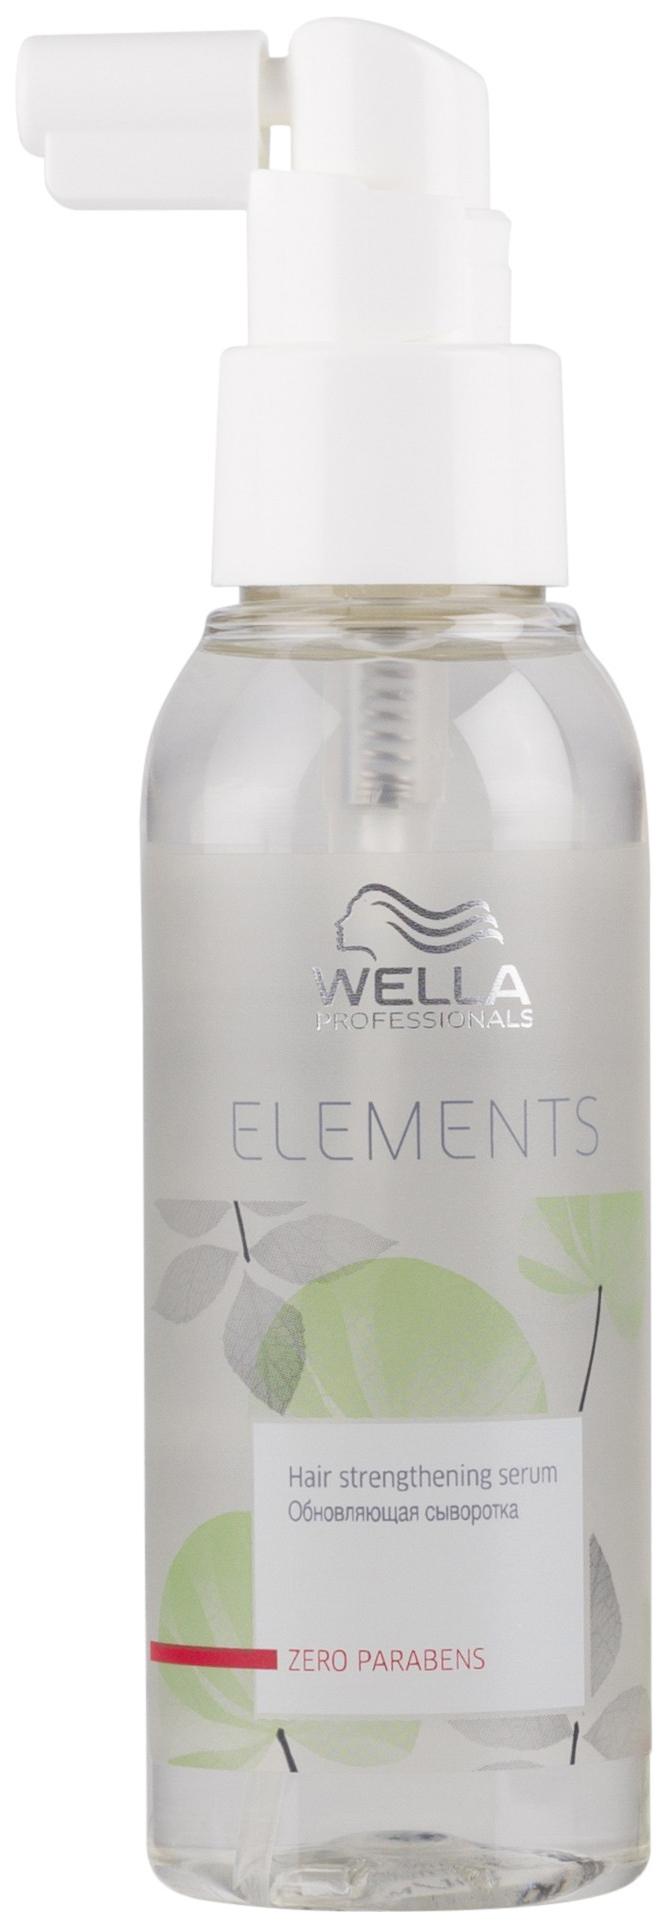 WELLA PROFESSIONALS HAIR STRENGTHENING SERUM